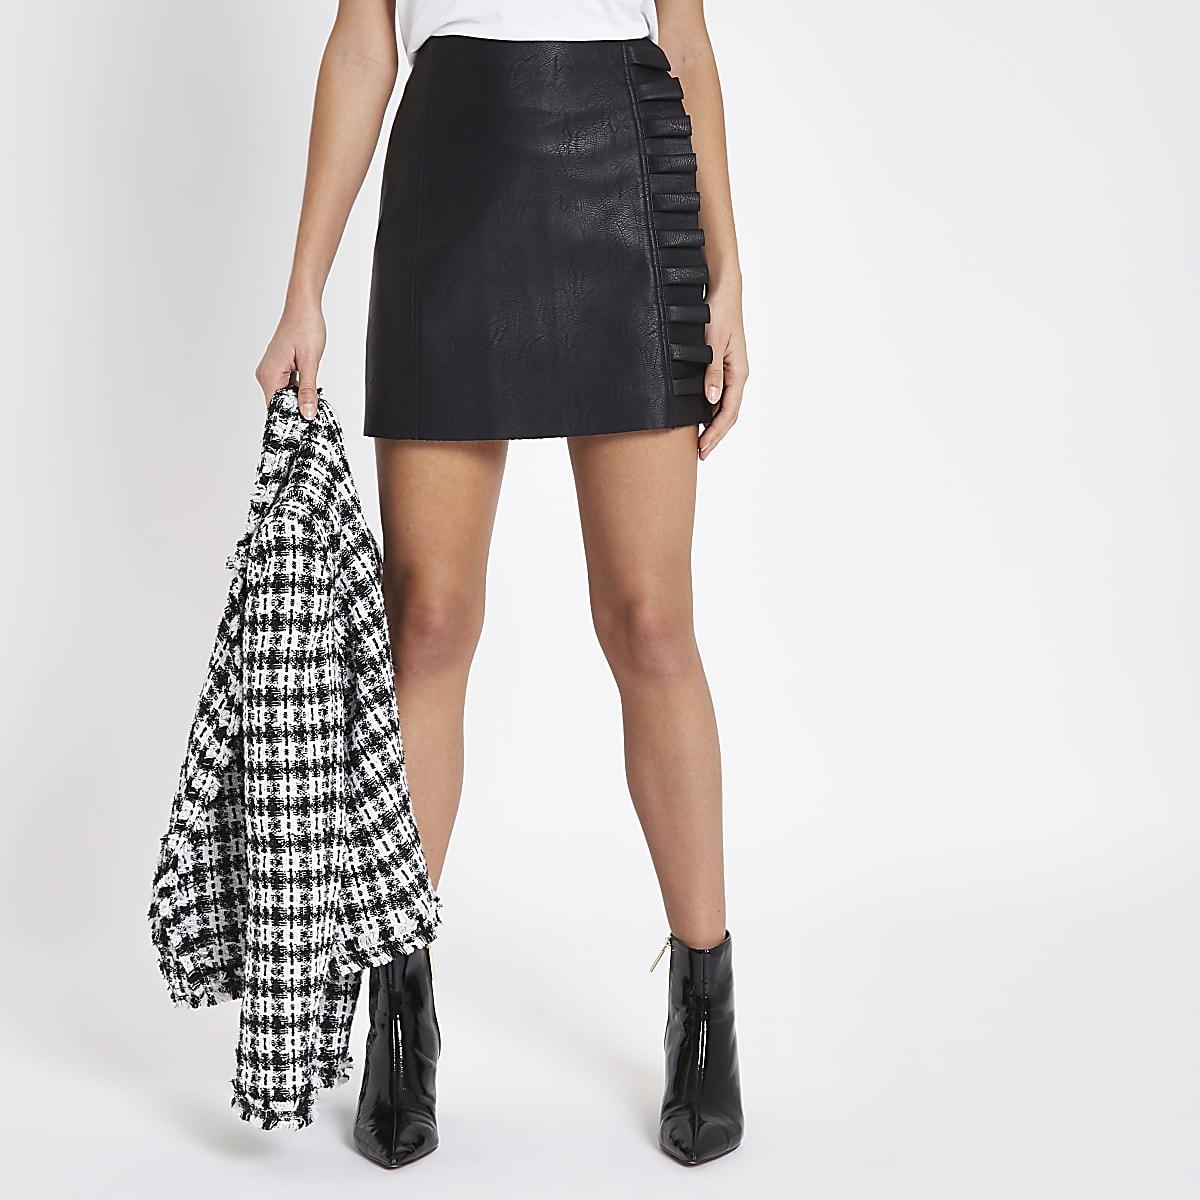 Black faux leather frill side mini skirt